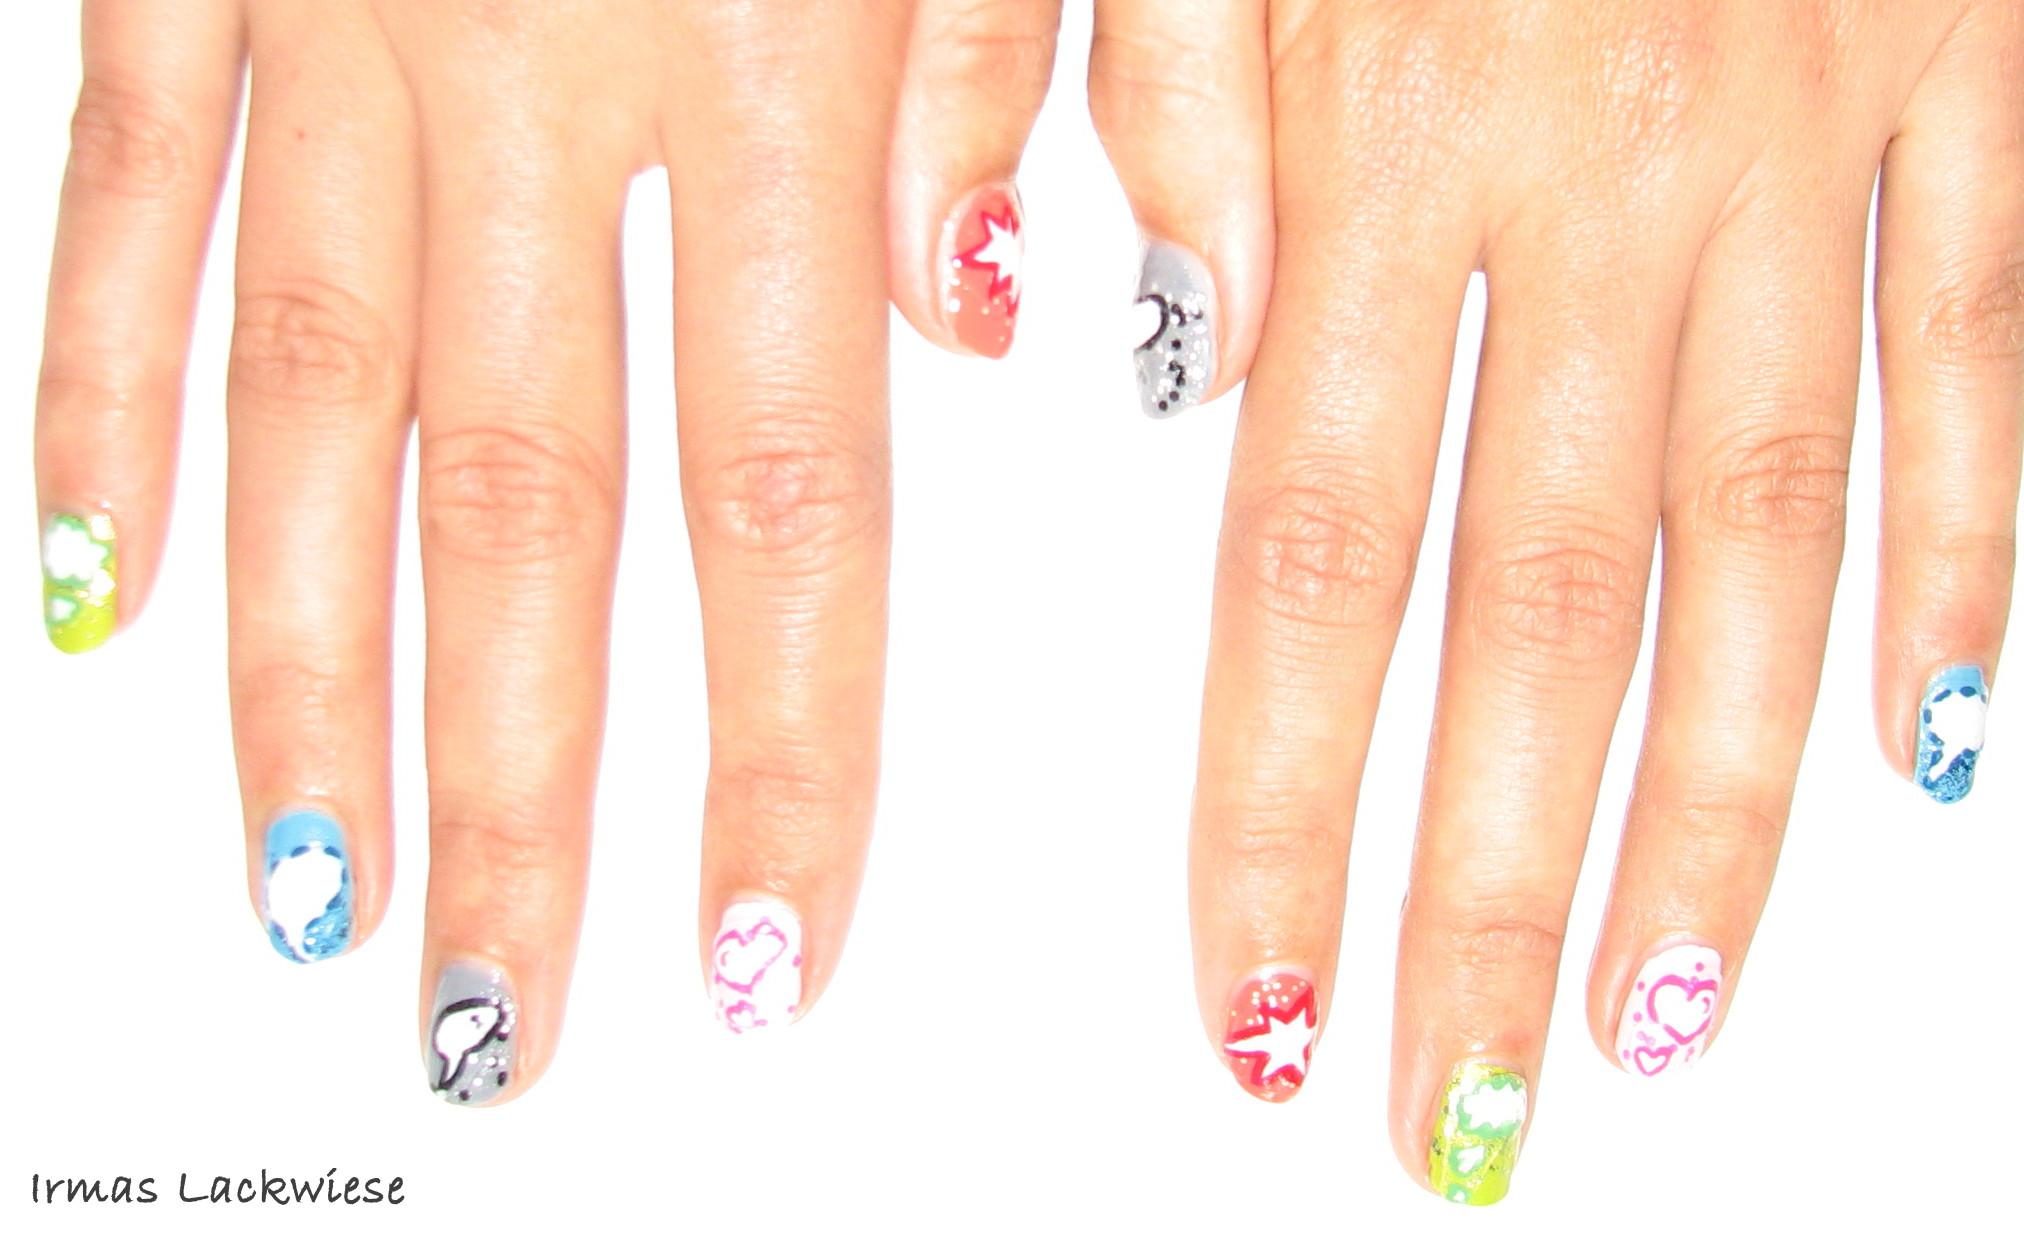 Comicnägel + DIY Nail Sticker – Irmas Lackwiese